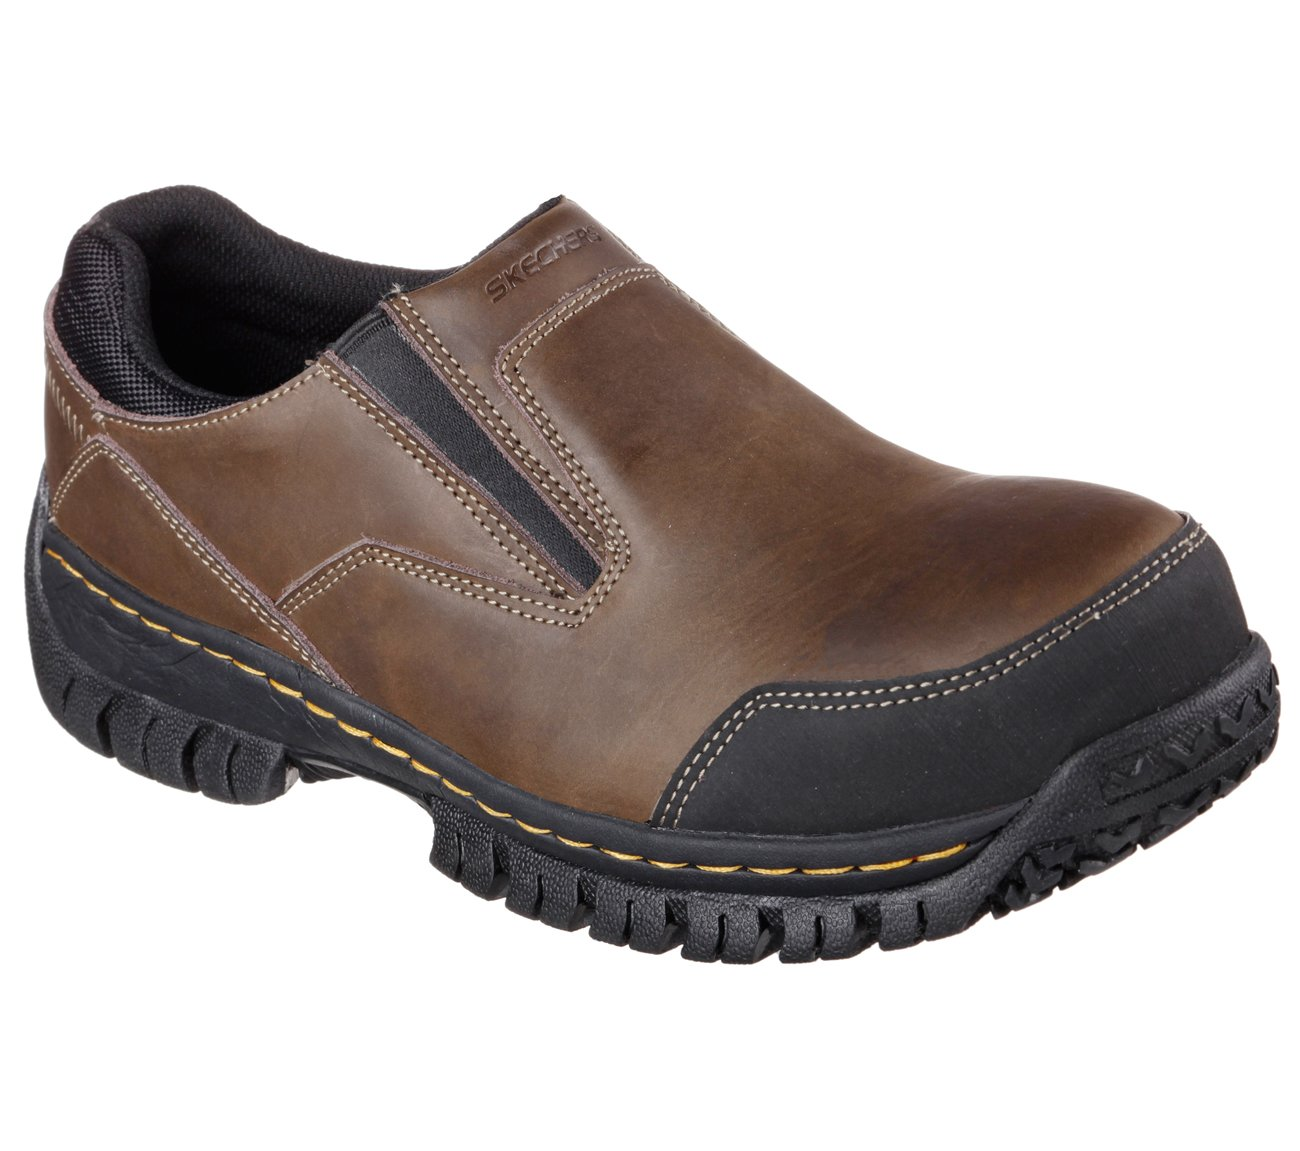 Skechers Work Relaxed Fit Hartan ST Mens Steel Toe Slip On Loafers Dark Brown 10 W